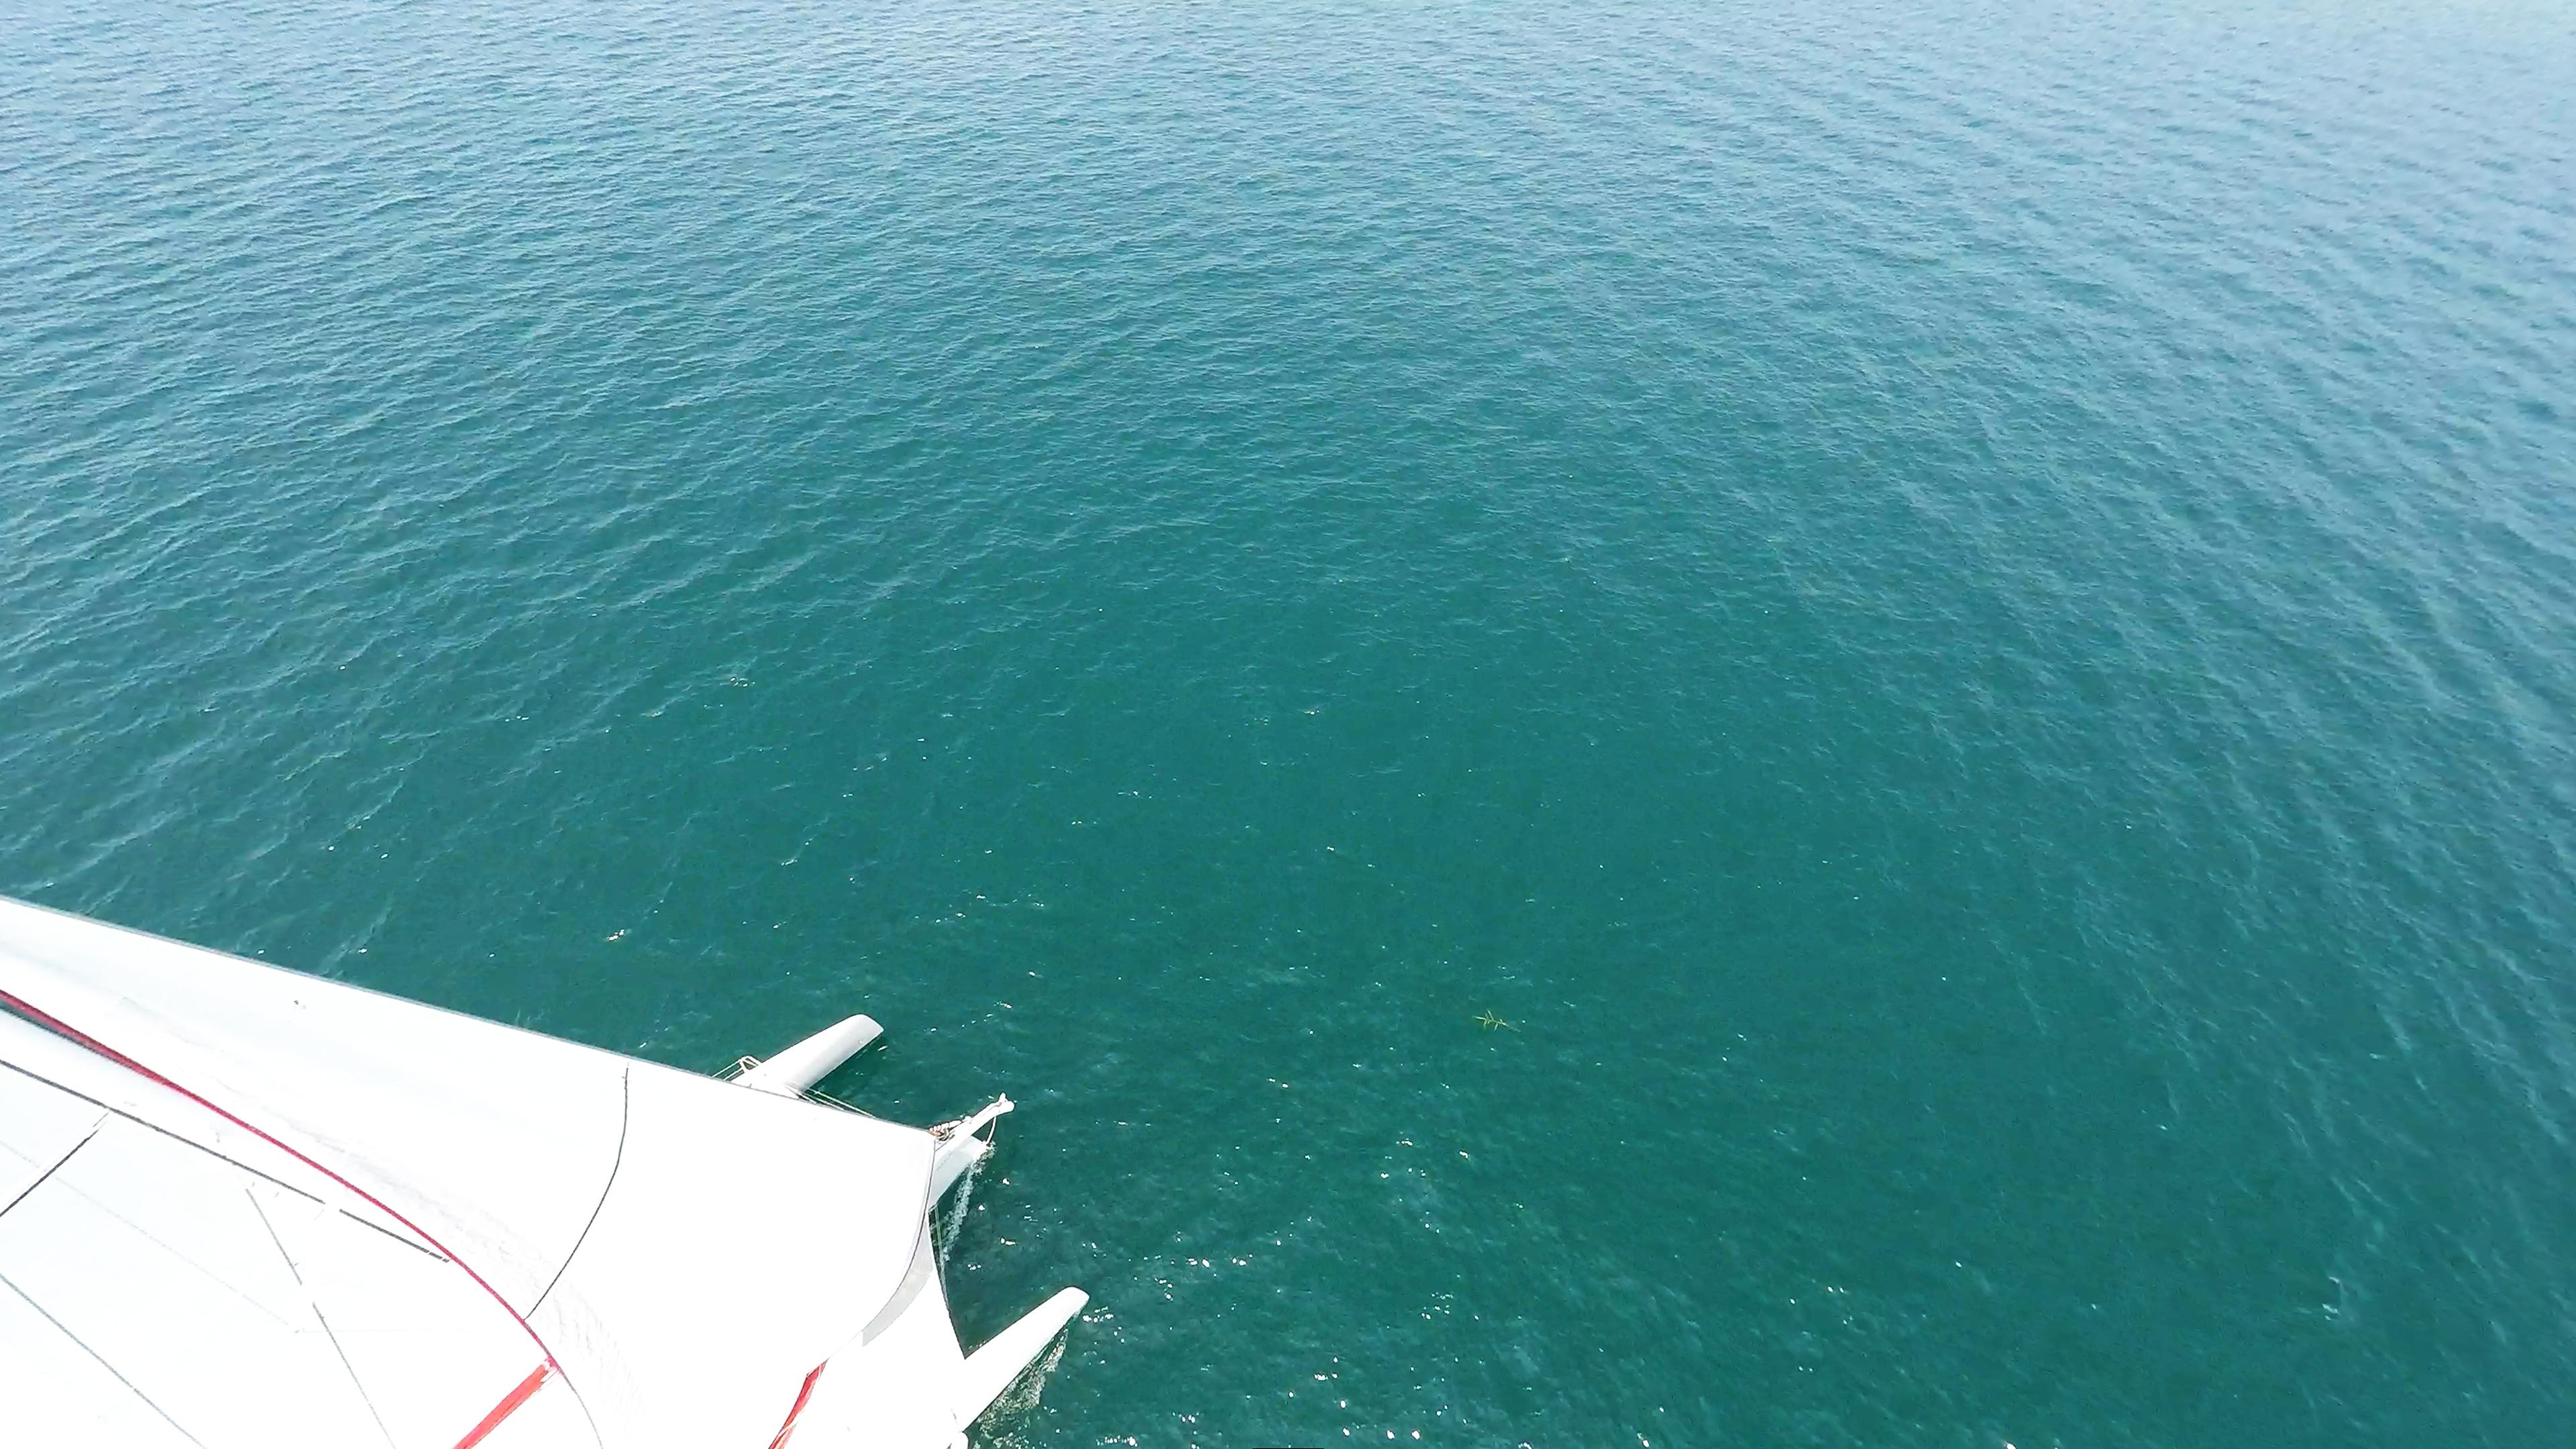 prua di multiscafo yacht sul blu-verde mare